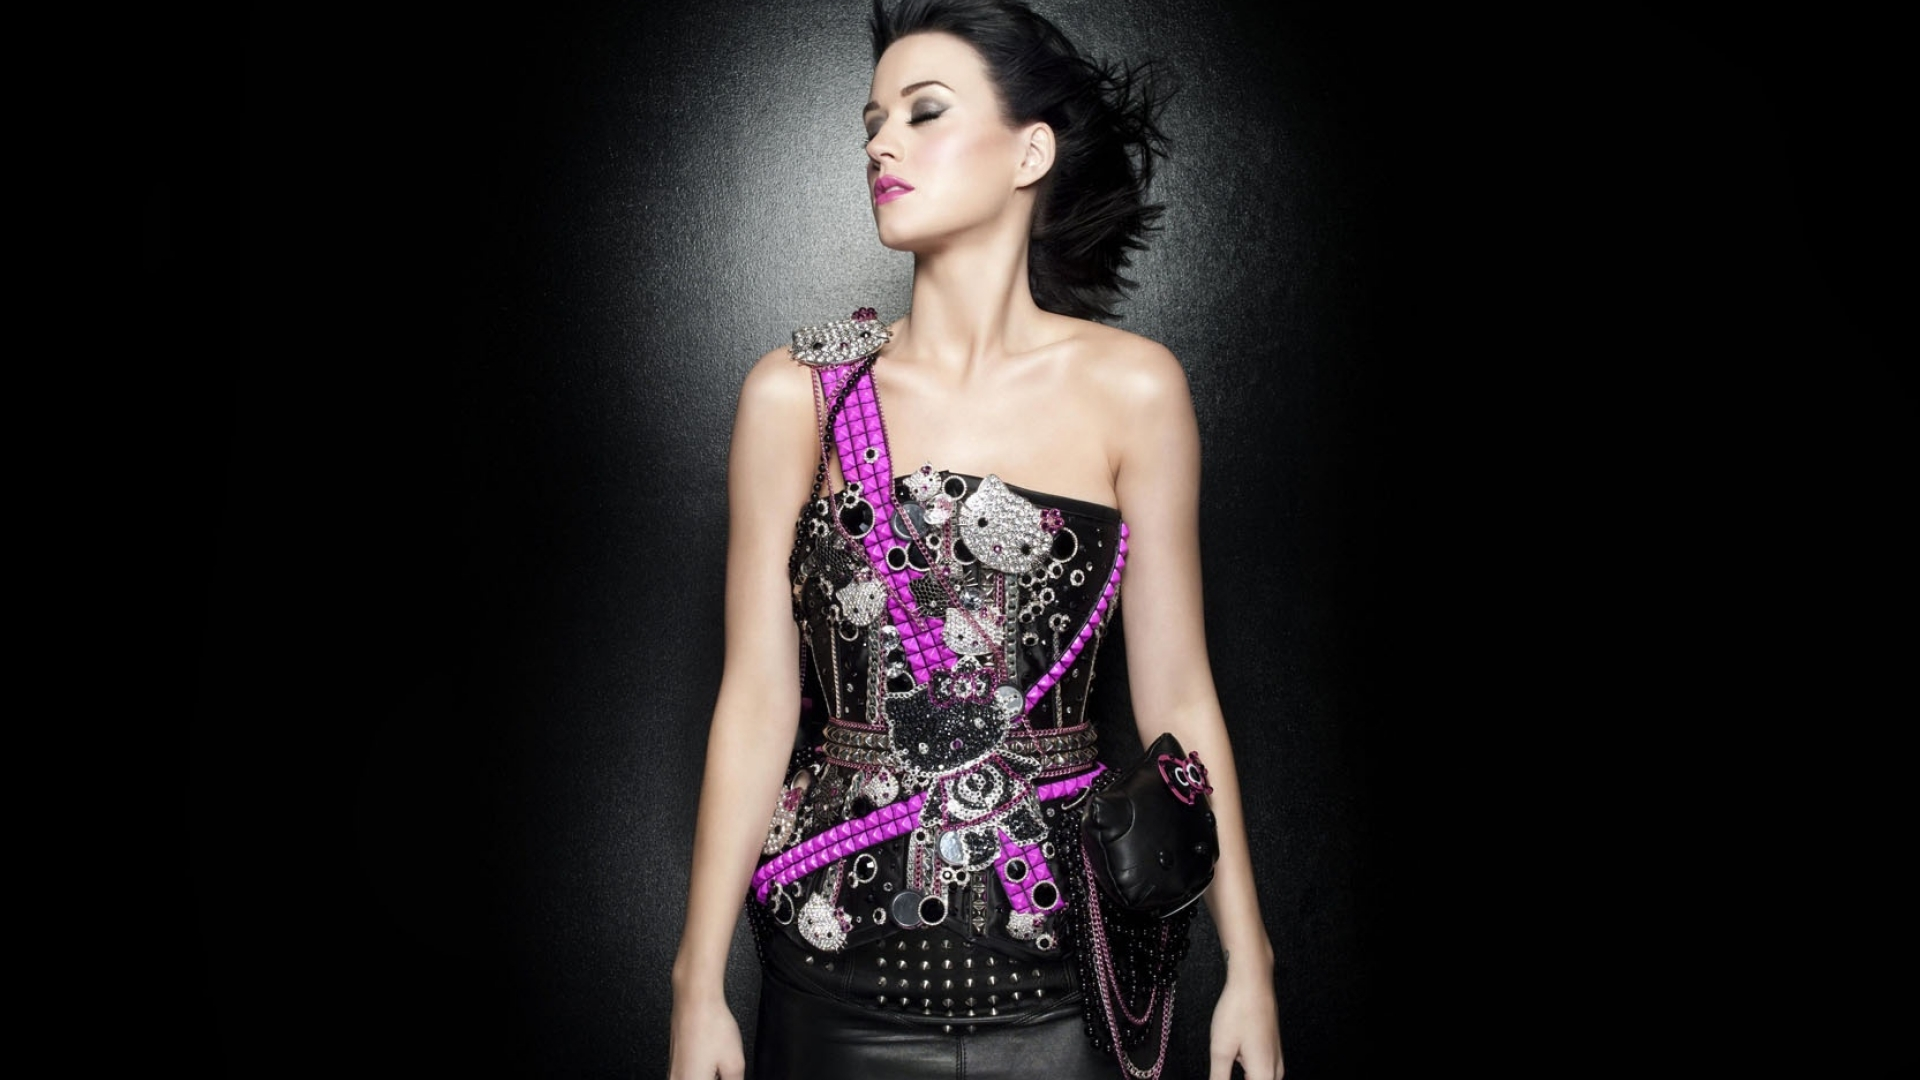 Katy Perry singer wallpaper